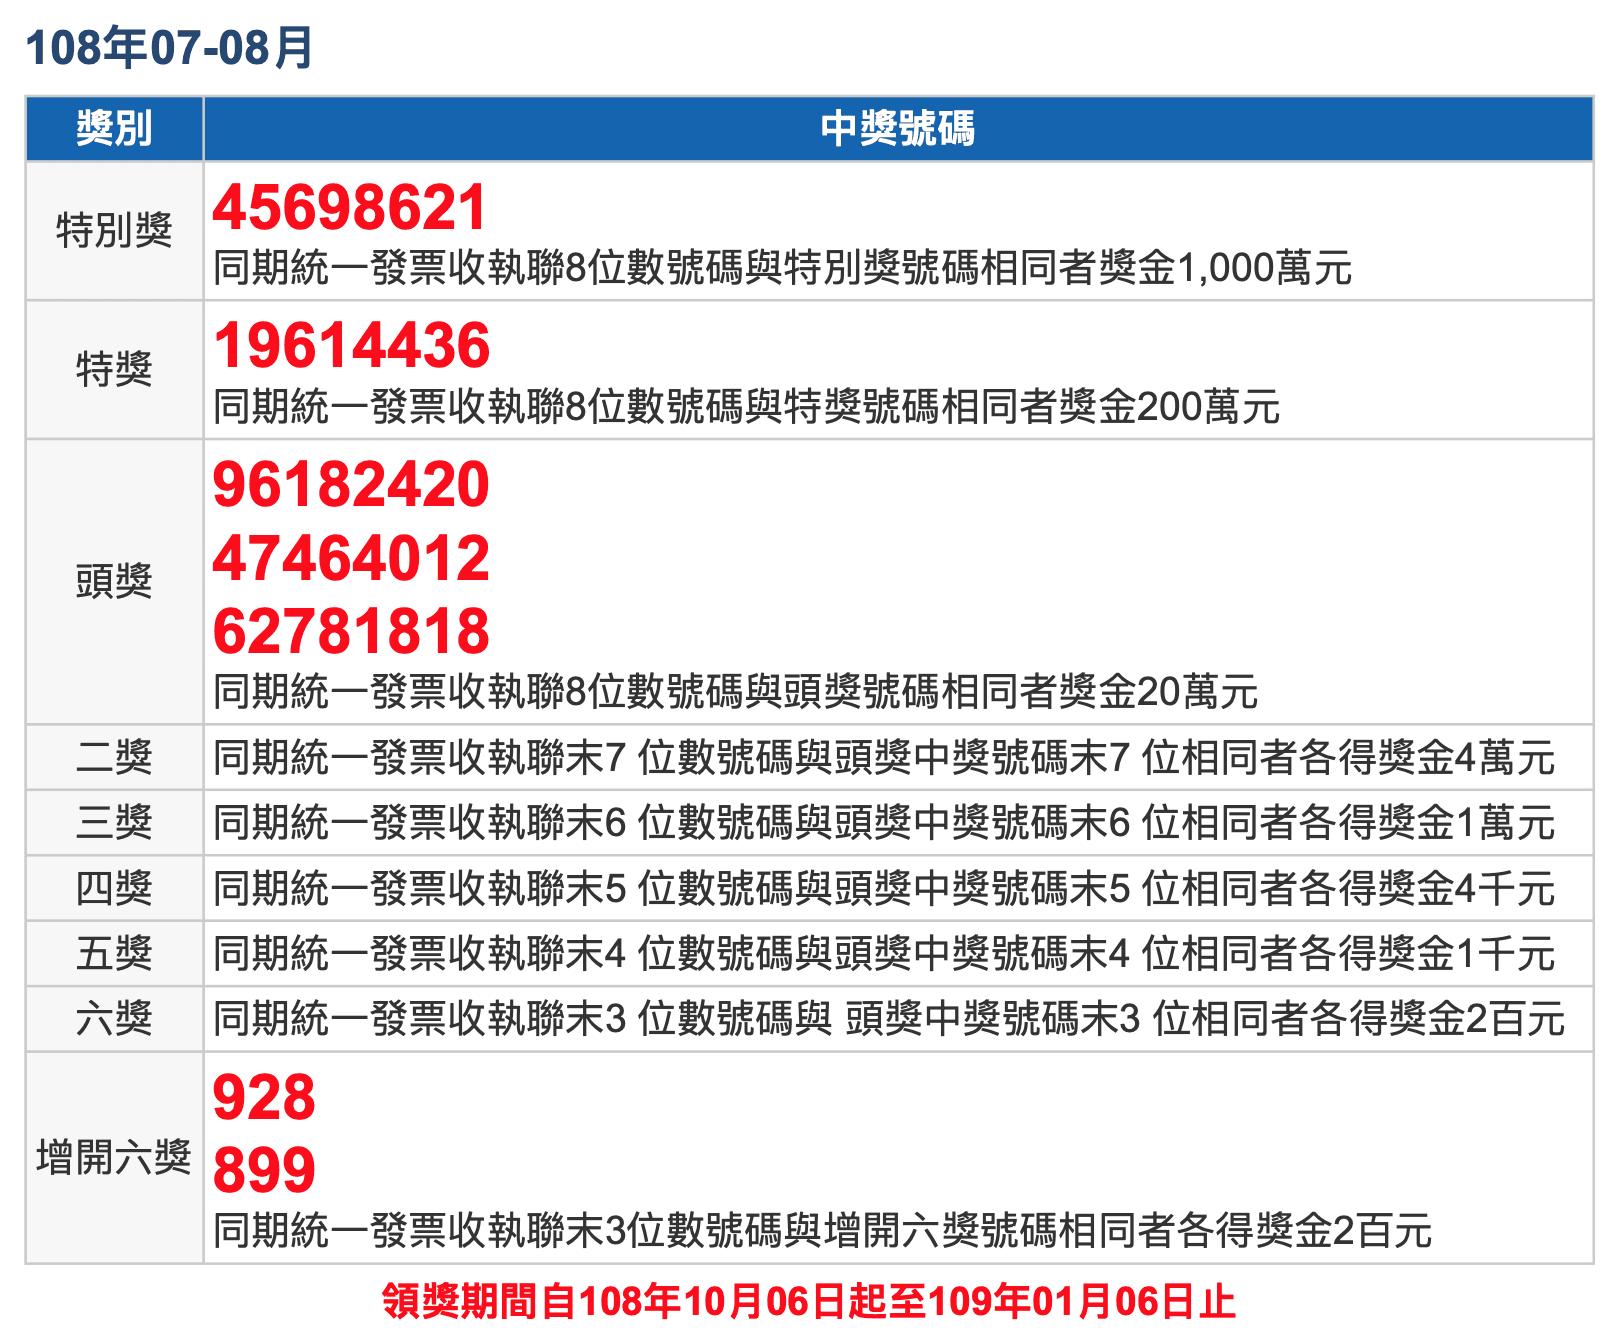 Uniform invoice winning numbers Taiwan ROC July August 2019. 民國 108 年 7、8 月統一發票號碼中獎號碼、獎金兌獎說明 2019